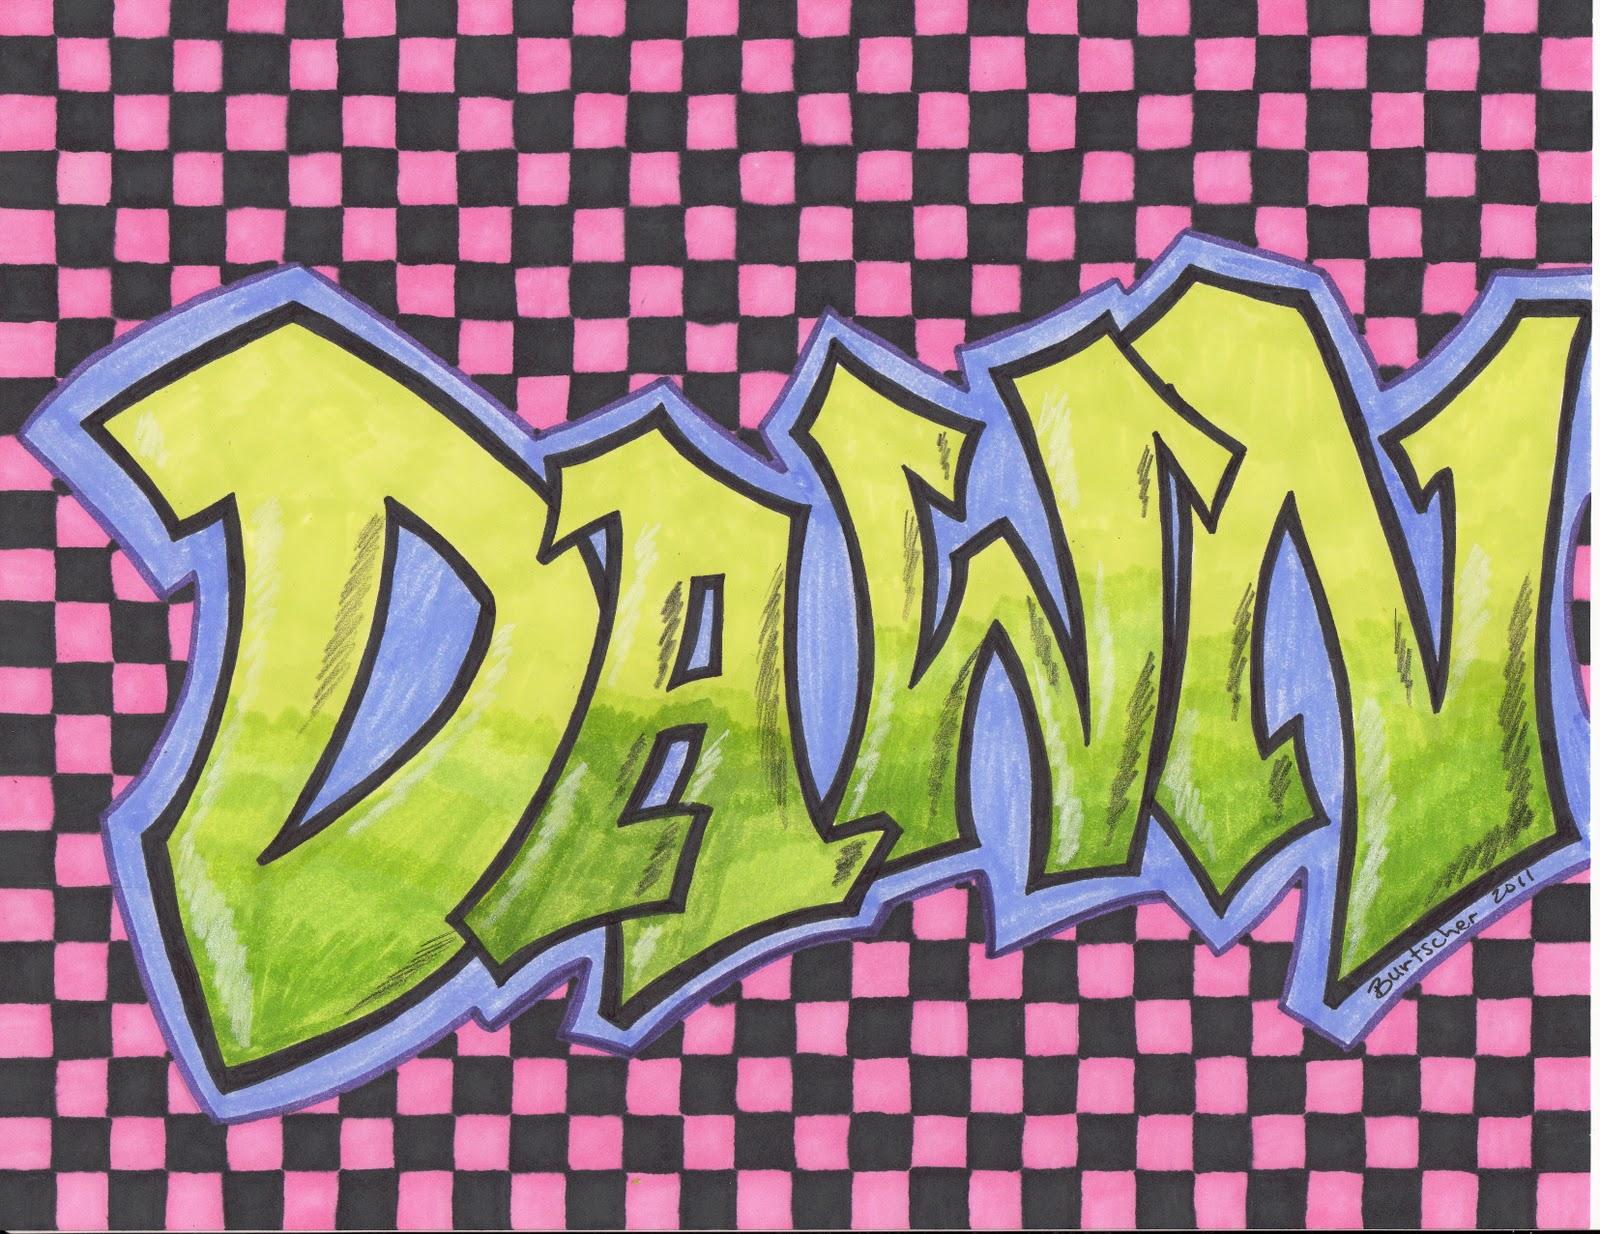 Joey graffiti name glax cool graffiti names good art name the quoteko